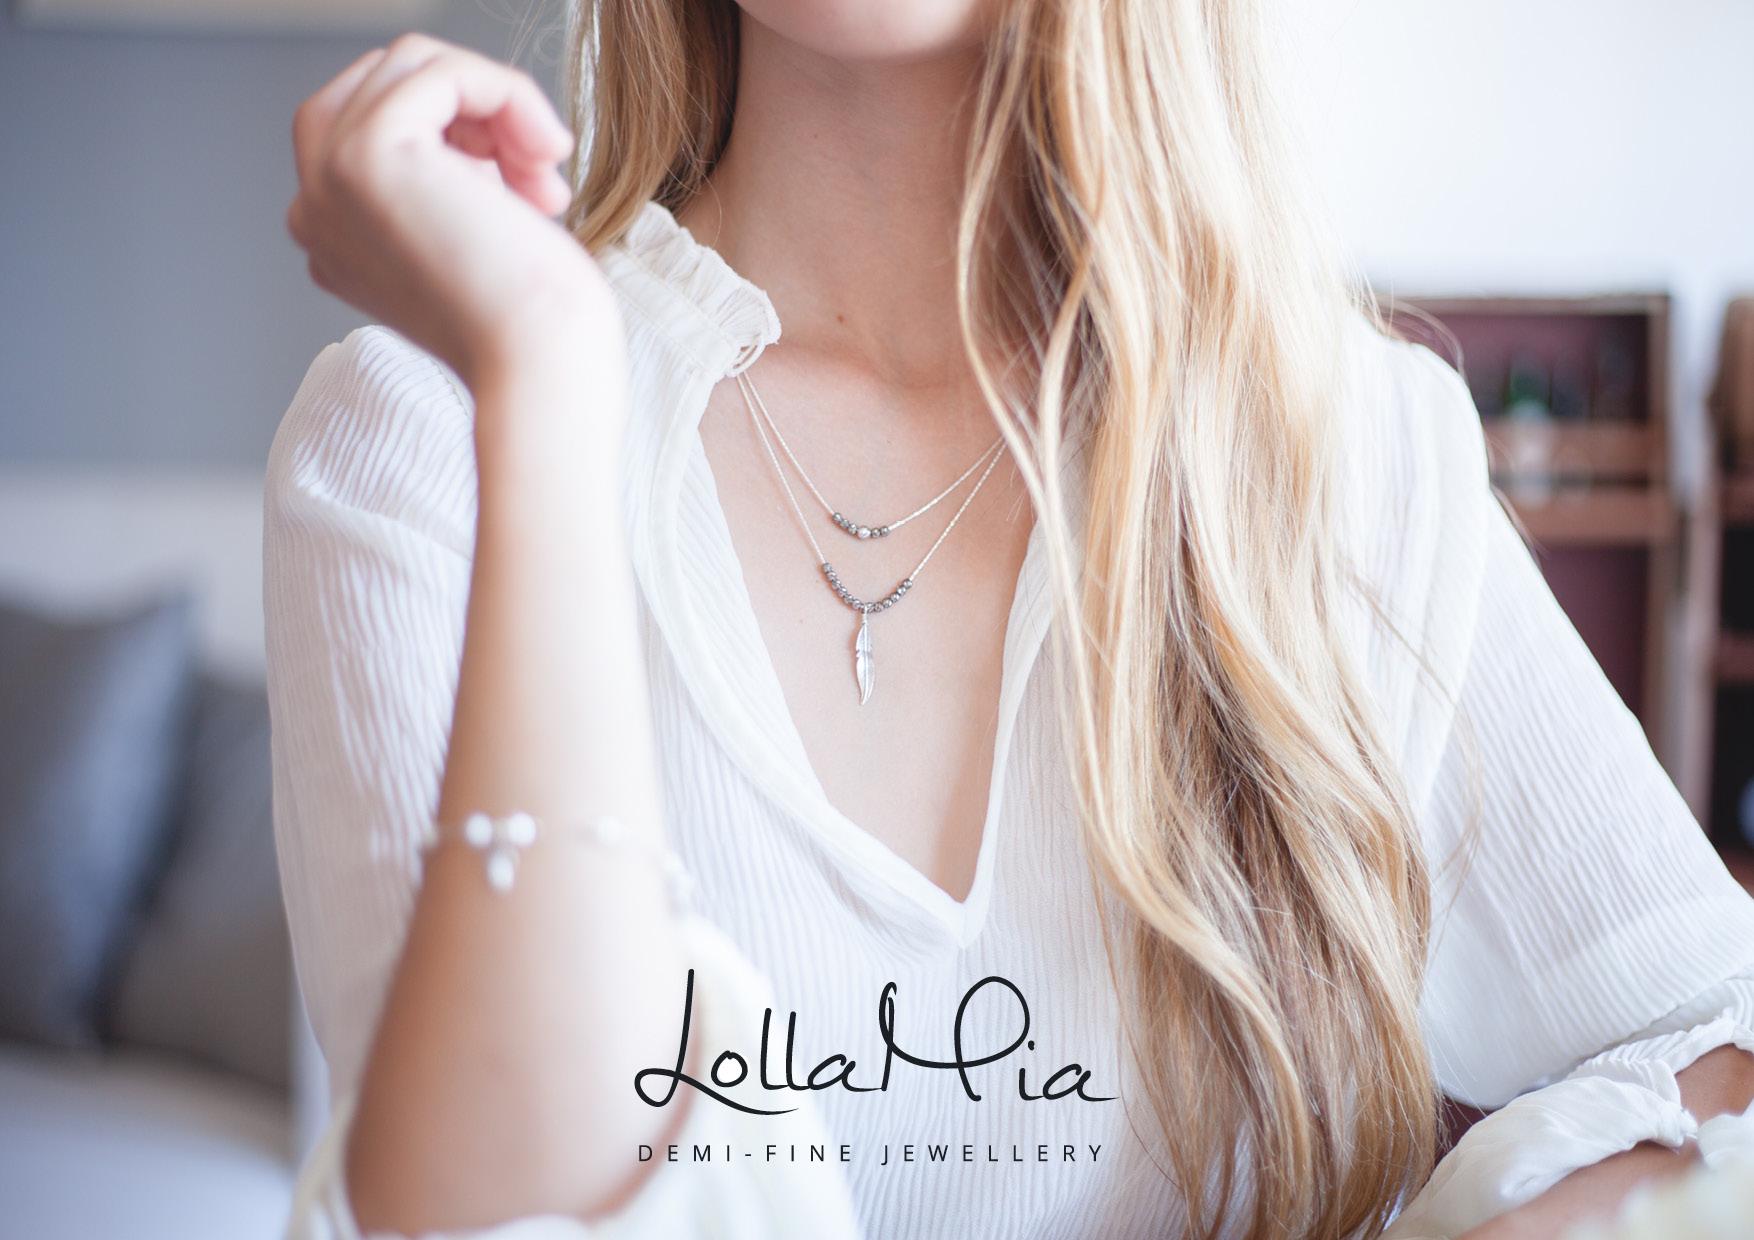 Lolla Mia Logo/Brand Creation | Logo Concept Personal Touch